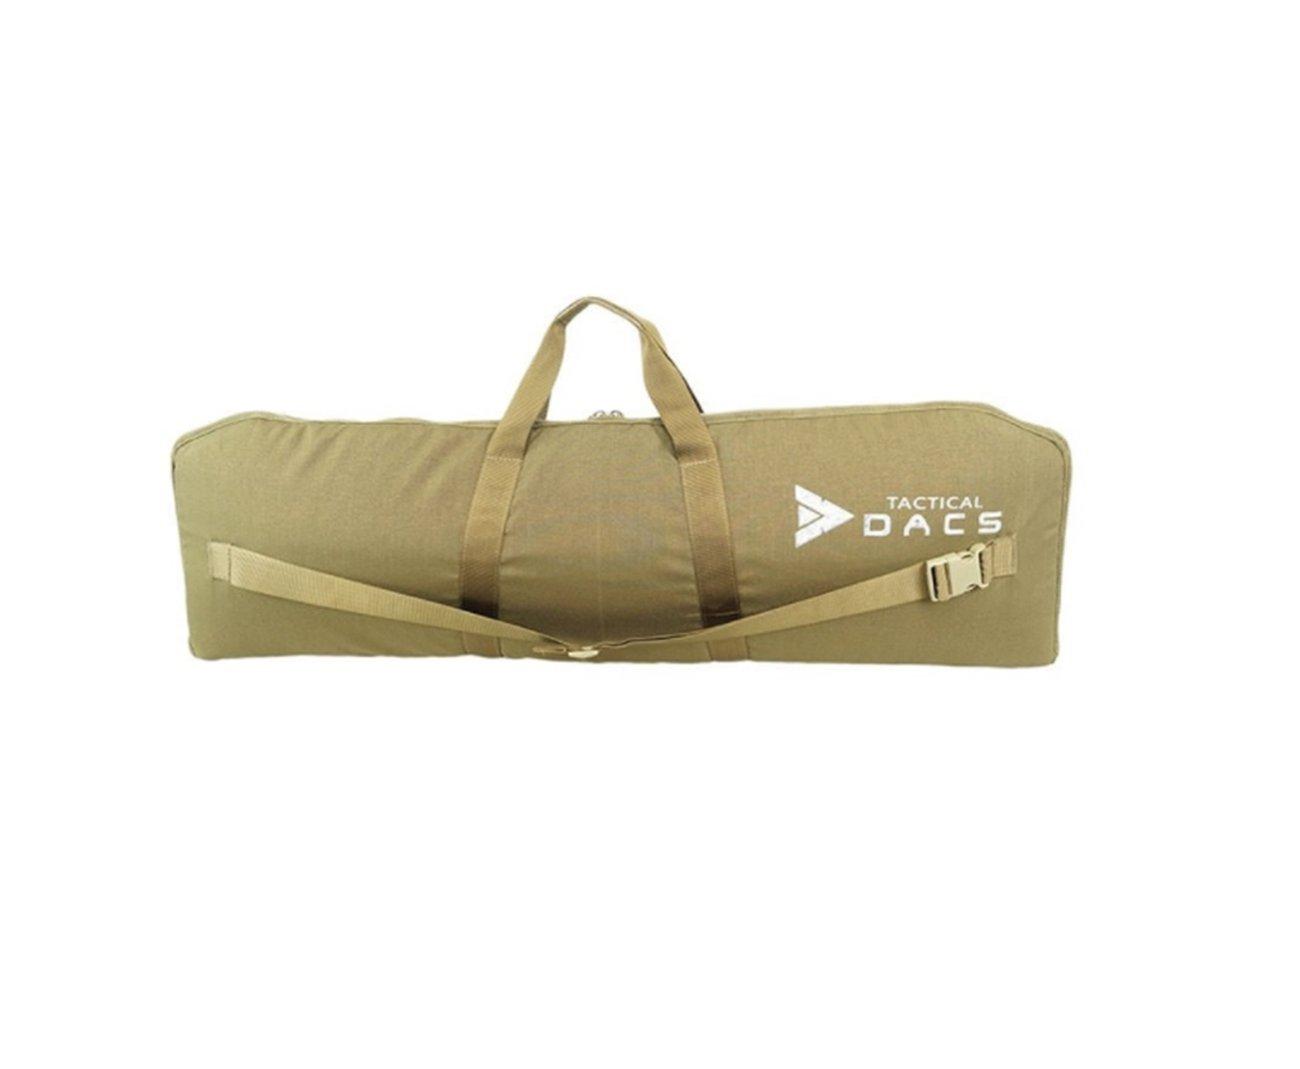 Case Para Arma De Airsoft - 1,00 M X 0,30 M - Dacs - Coyote